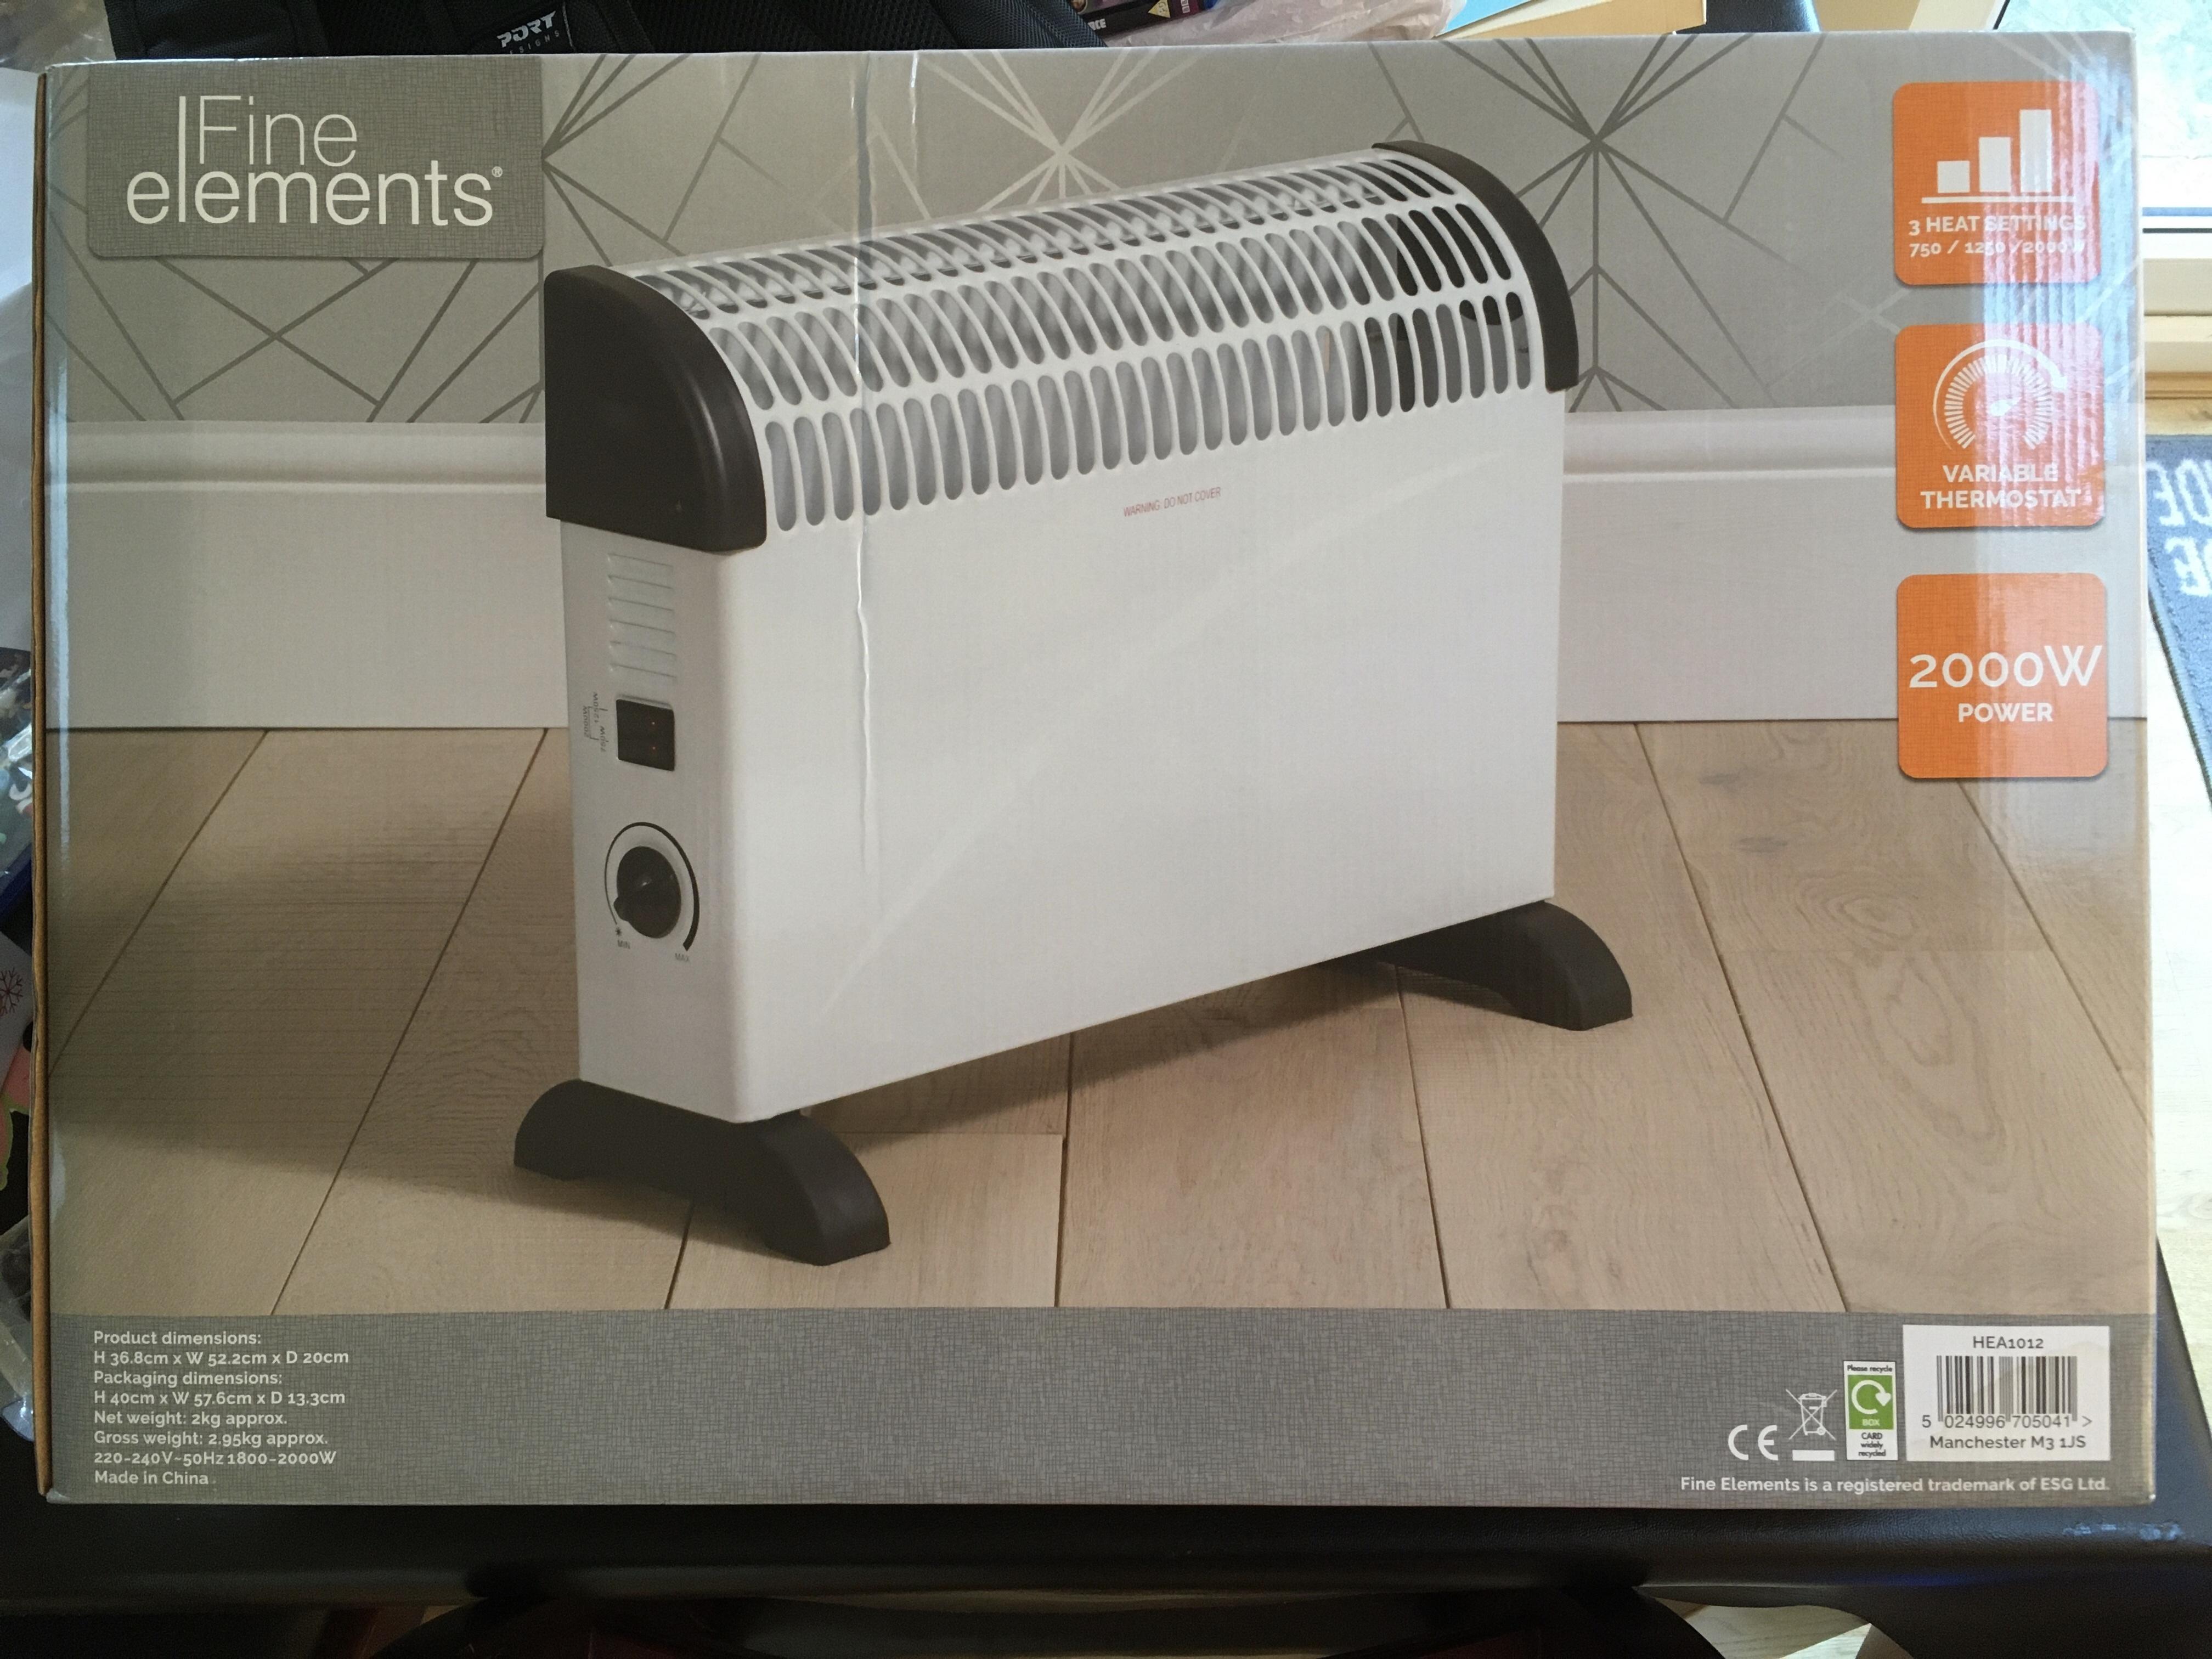 Fine elements 2000w heater £3.50 @ Tesco (Watford)